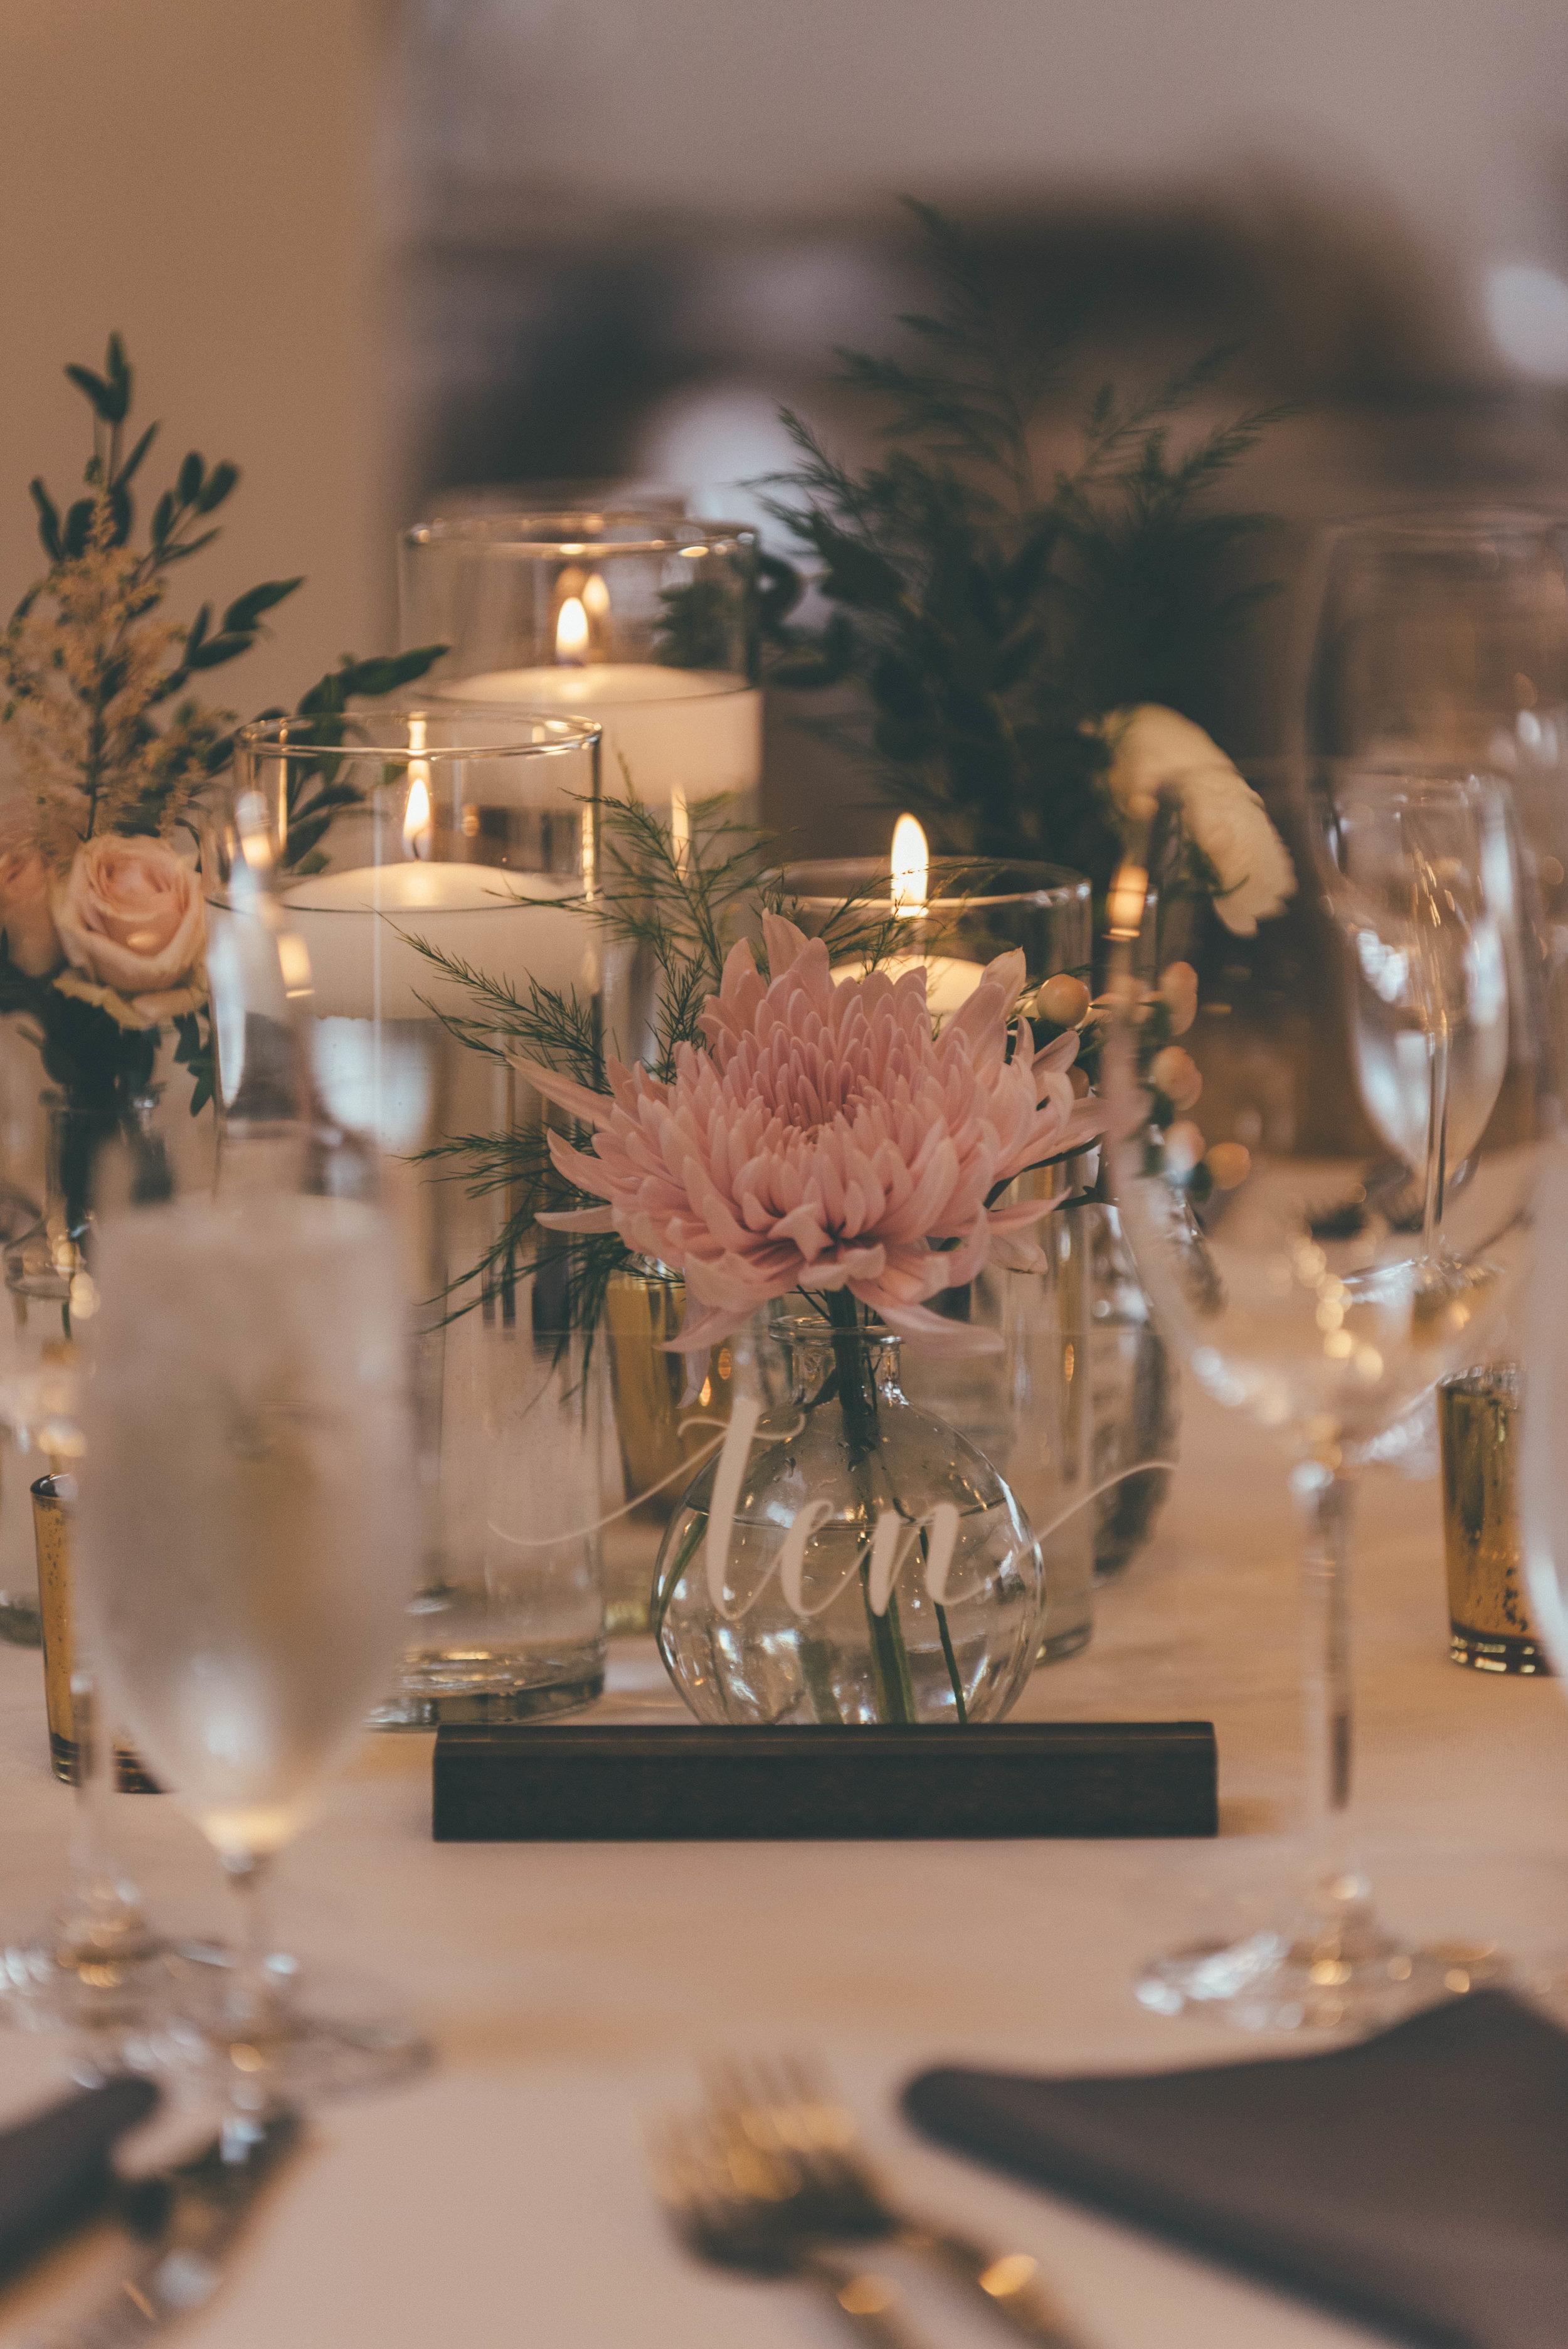 ChadFahnestockPhotography-mc-wedding-018.jpg